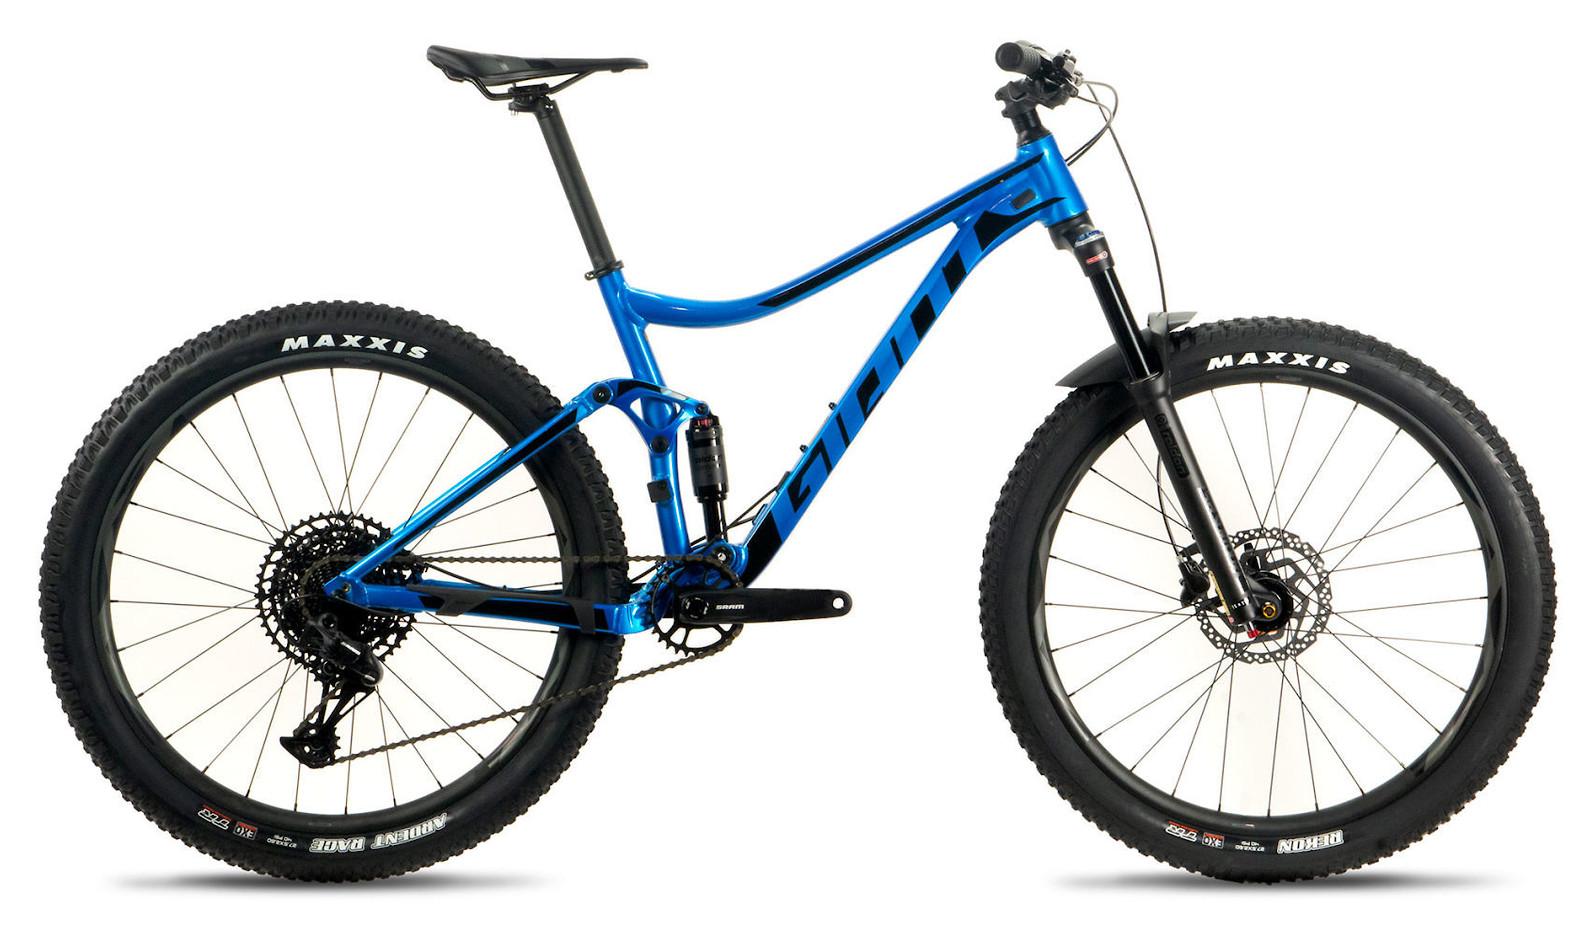 2020 Giant Stance 2 in Metallic Blue/Black